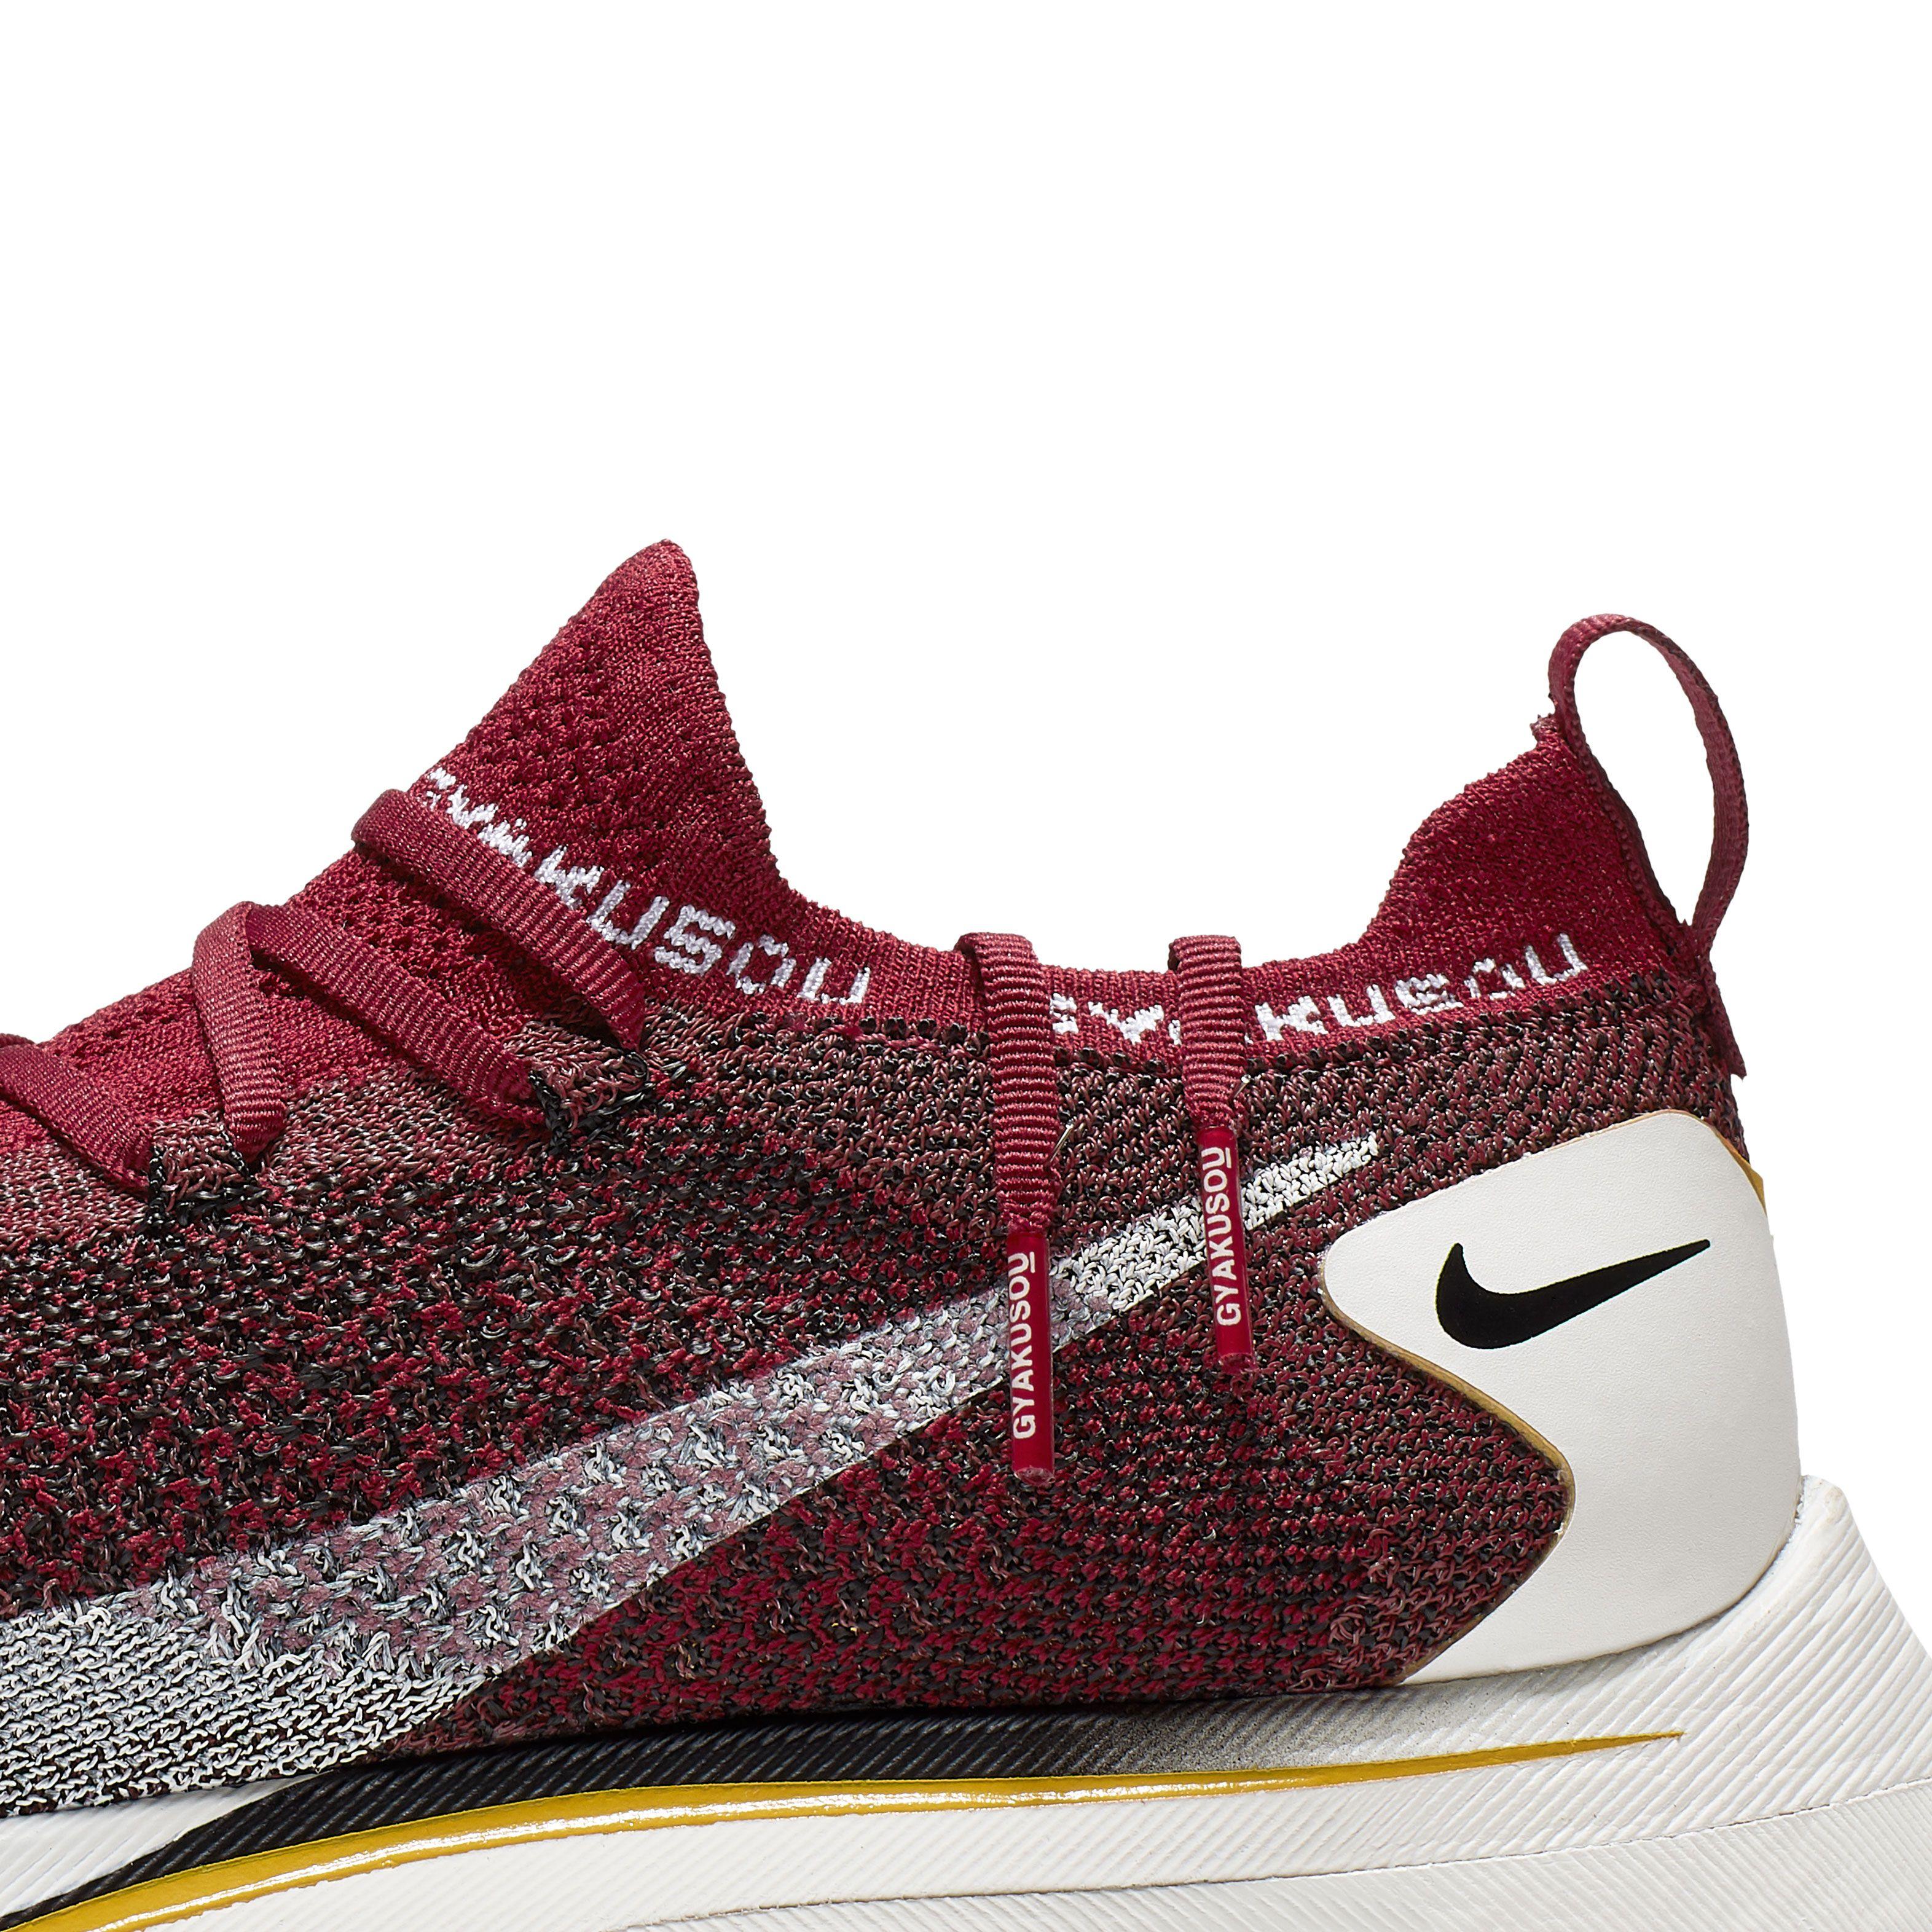 Nike s New Gyakusou Vaporfly 4% and Pegasus 35 Turbo Blend Fast and Flashy 145f923b8